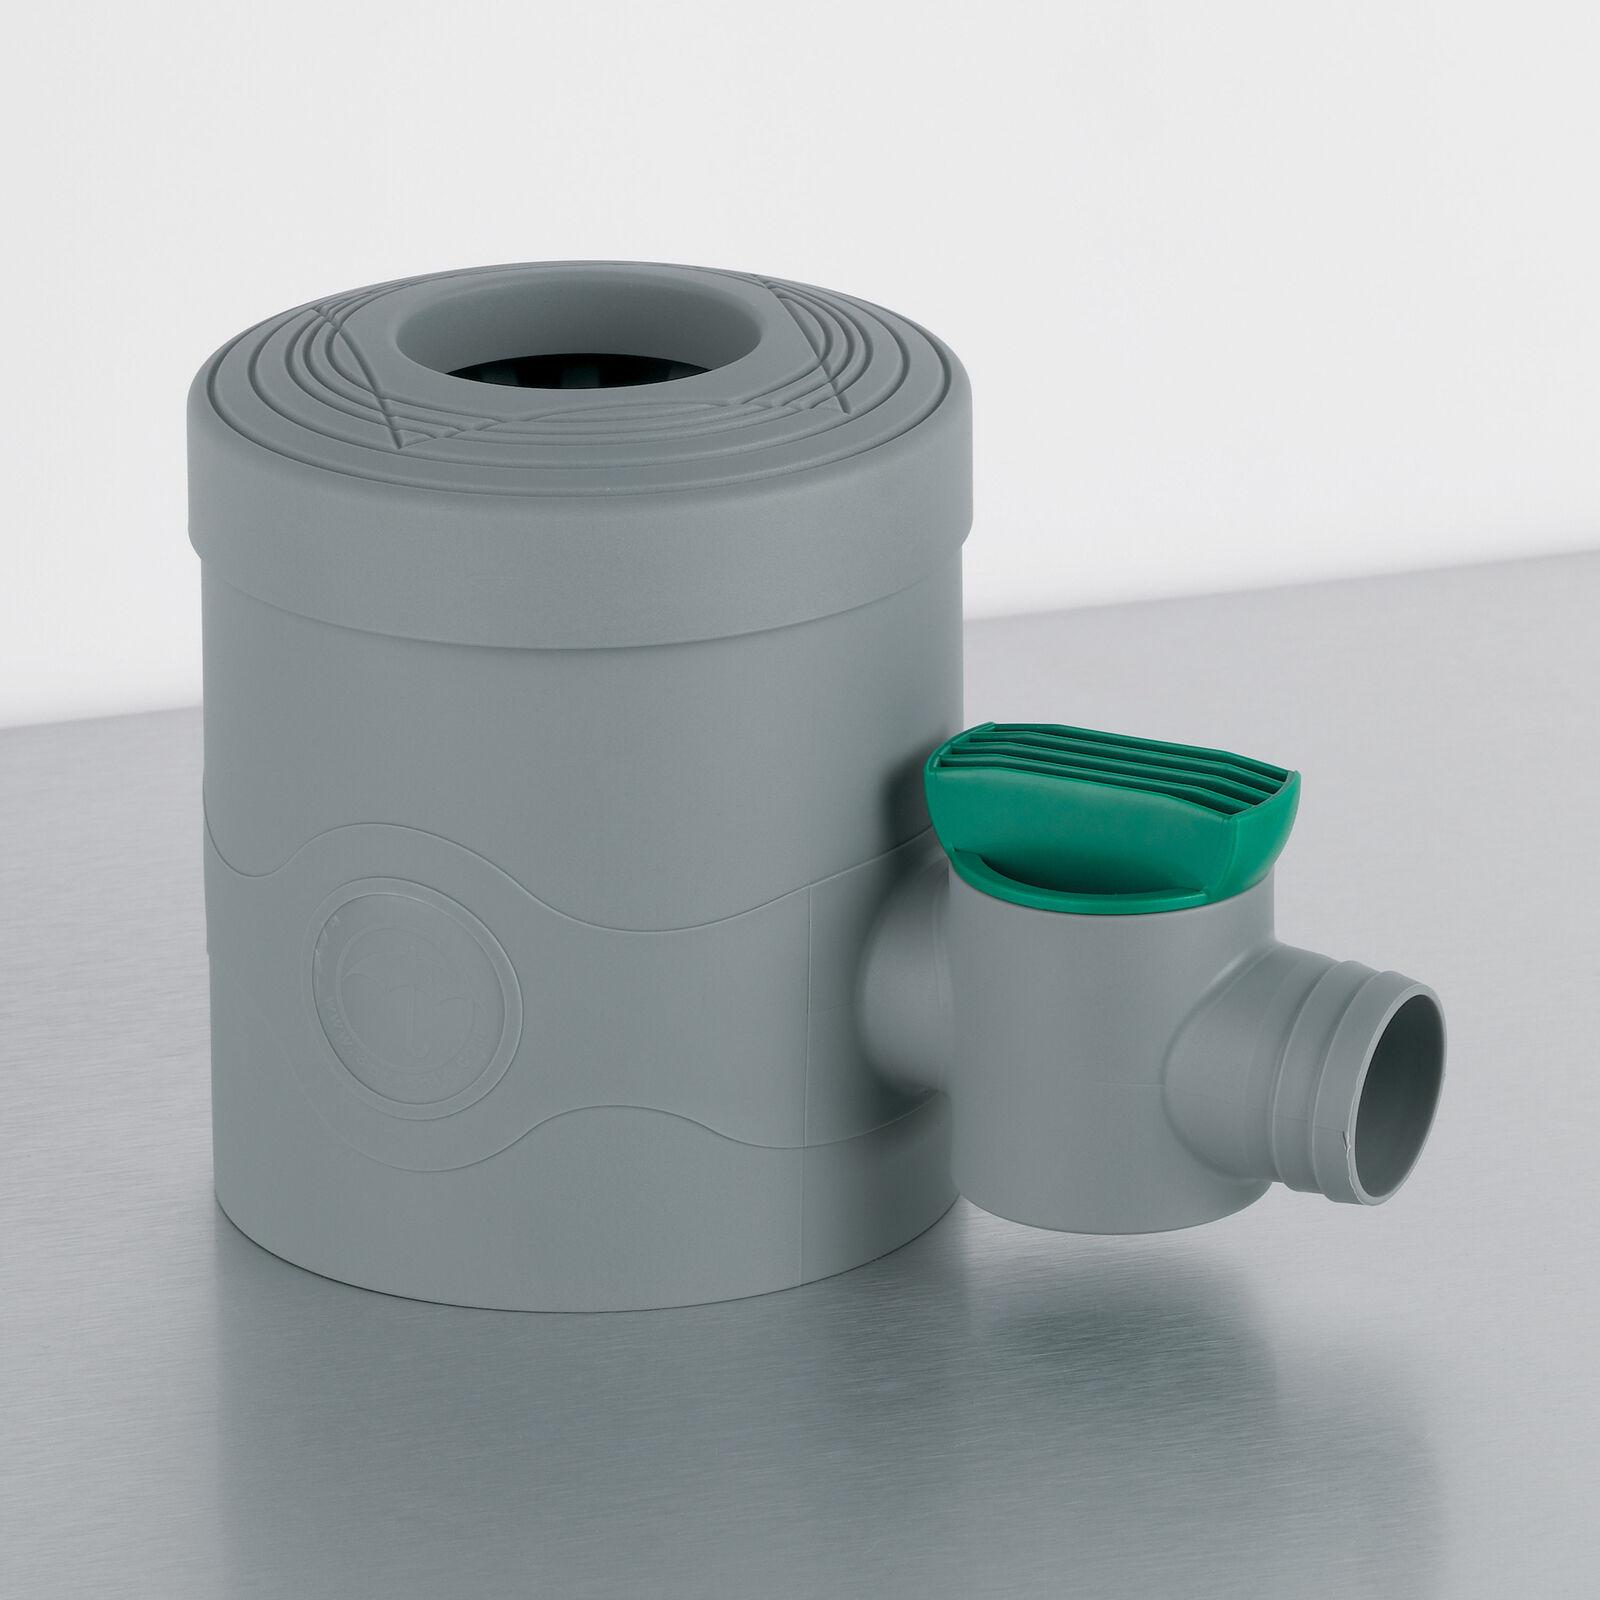 Regensammler Regenwassersammler Fallrohrfilter mit Absperrhahn grau